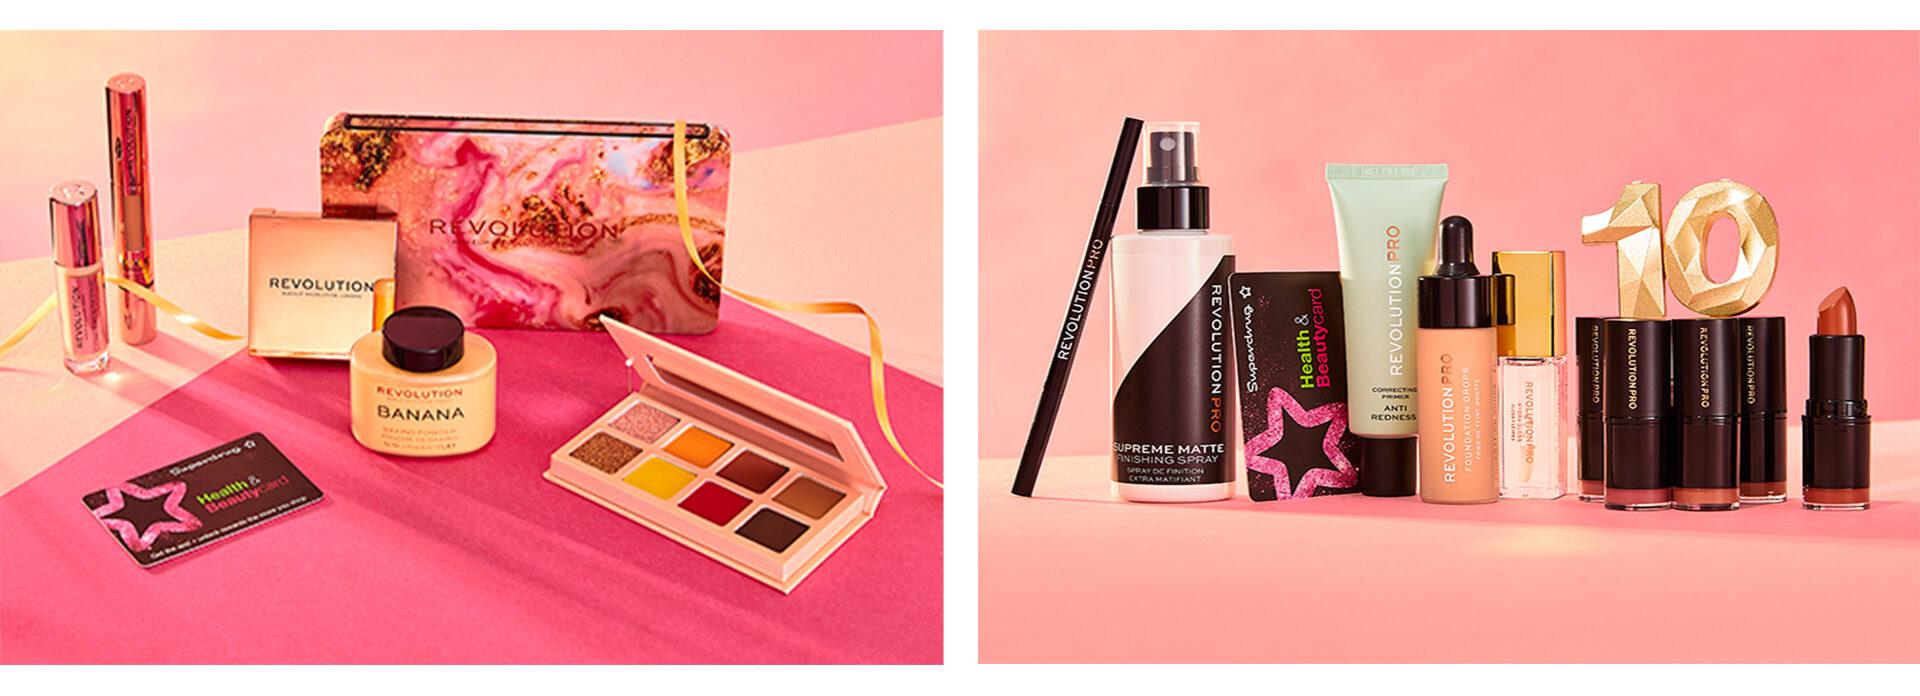 beauty cosmetics product photography